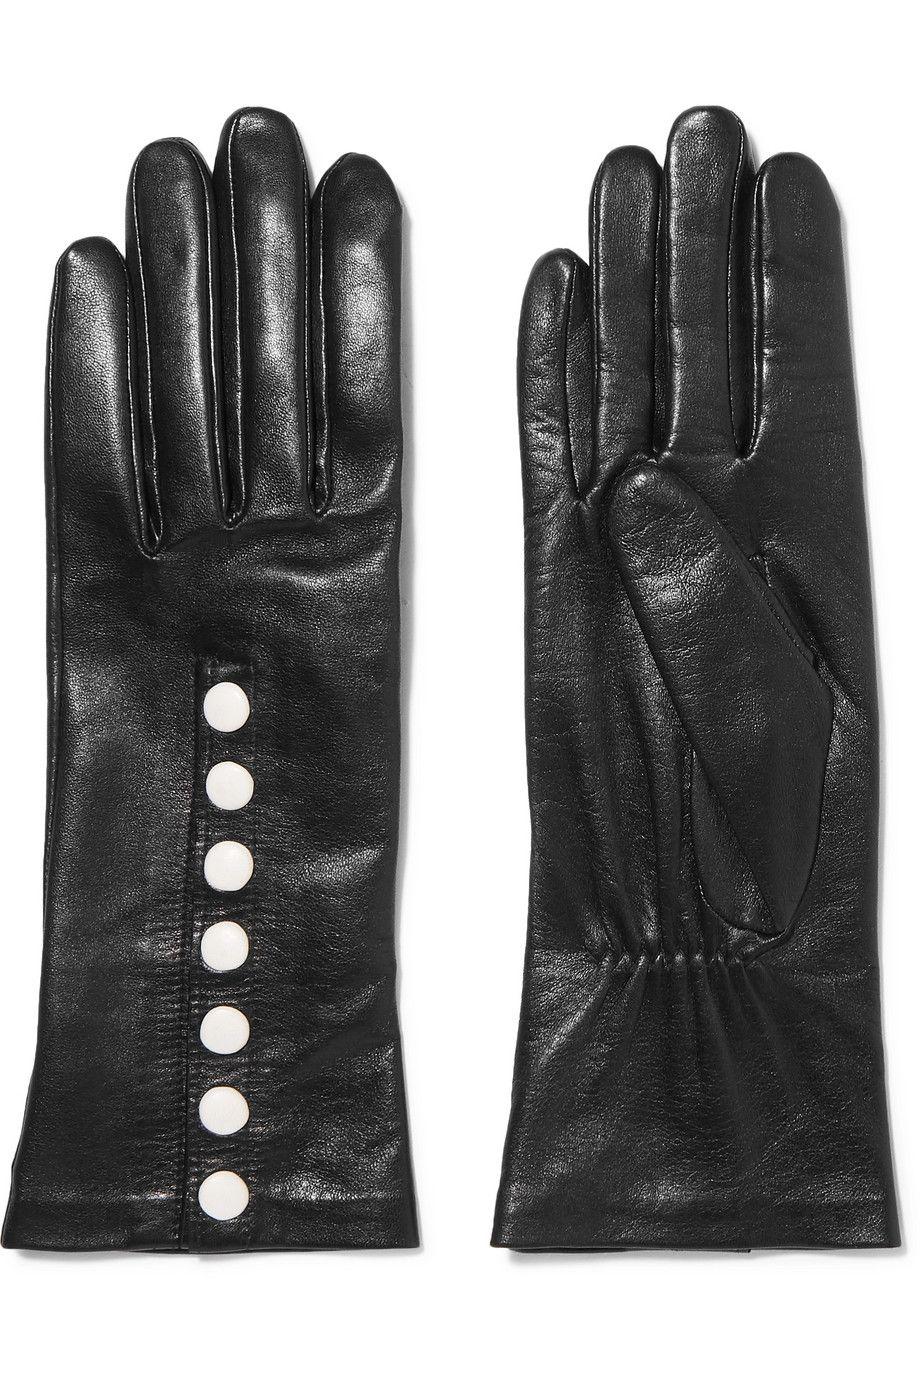 Evening-Gloves-1119